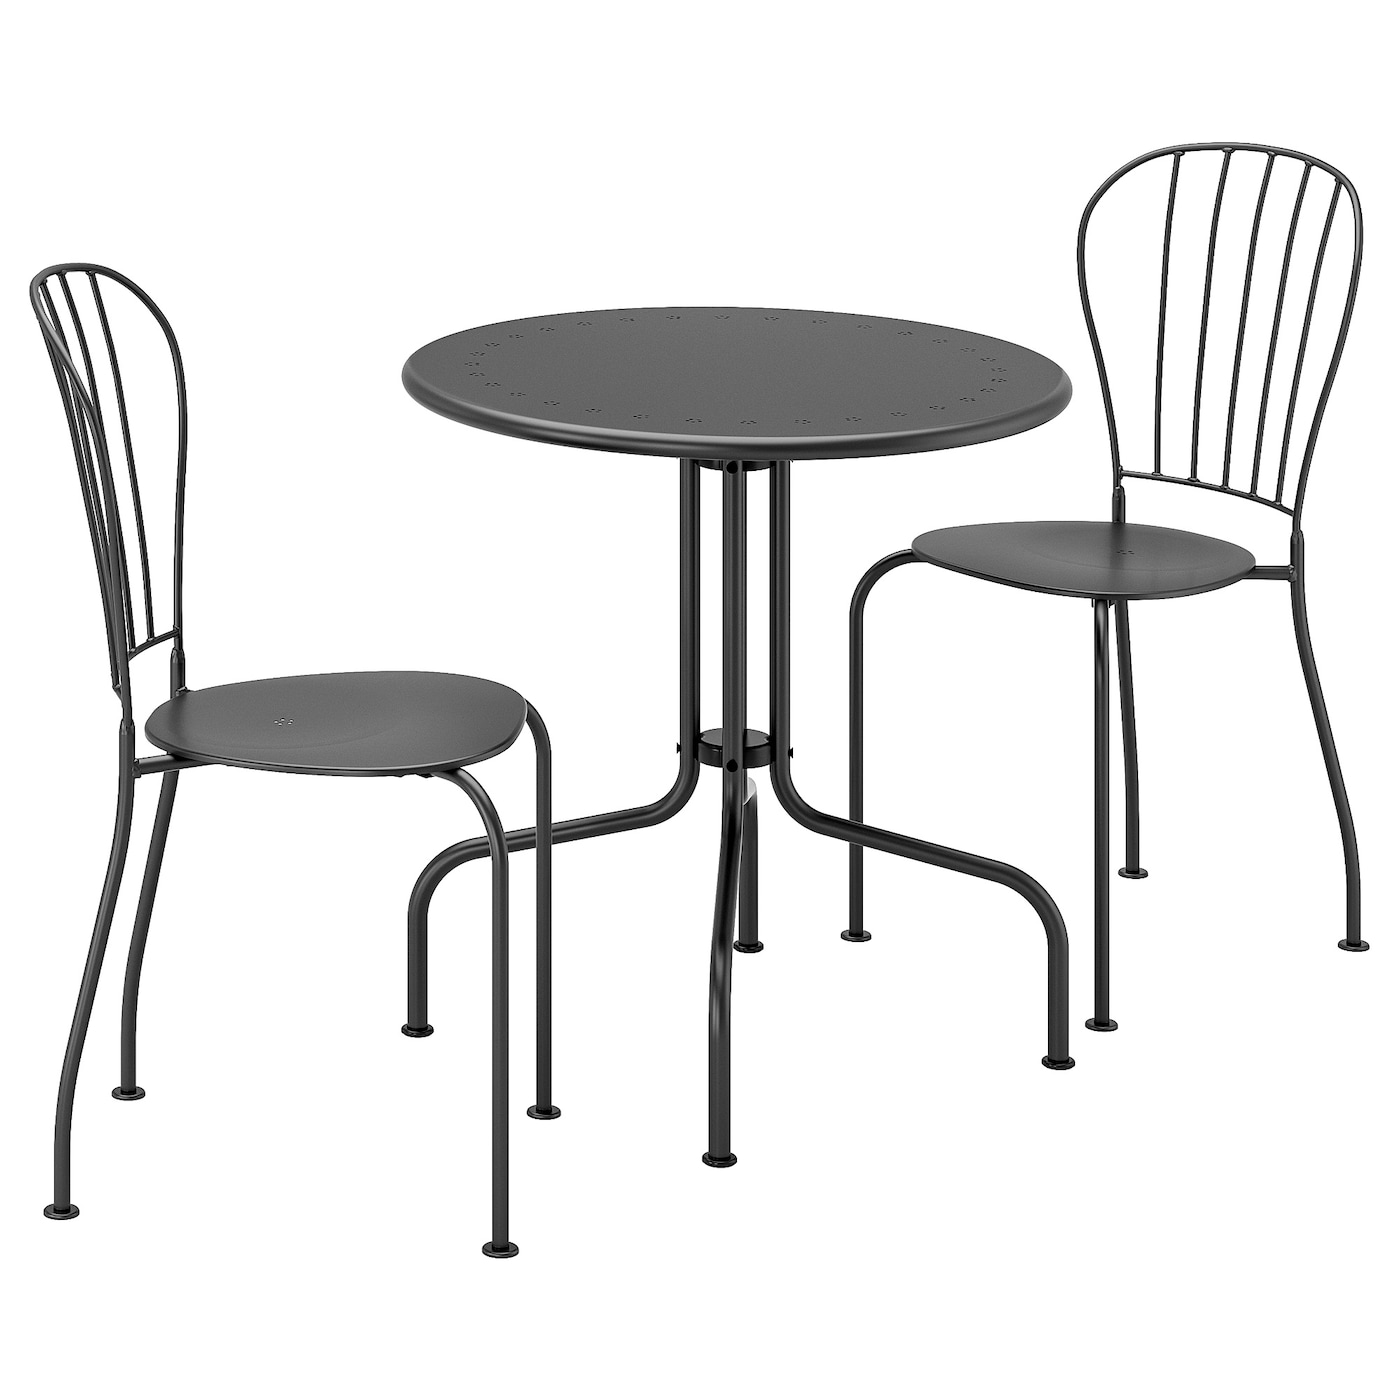 Table 2 Chairs Outdoor LÄckÖ Gray